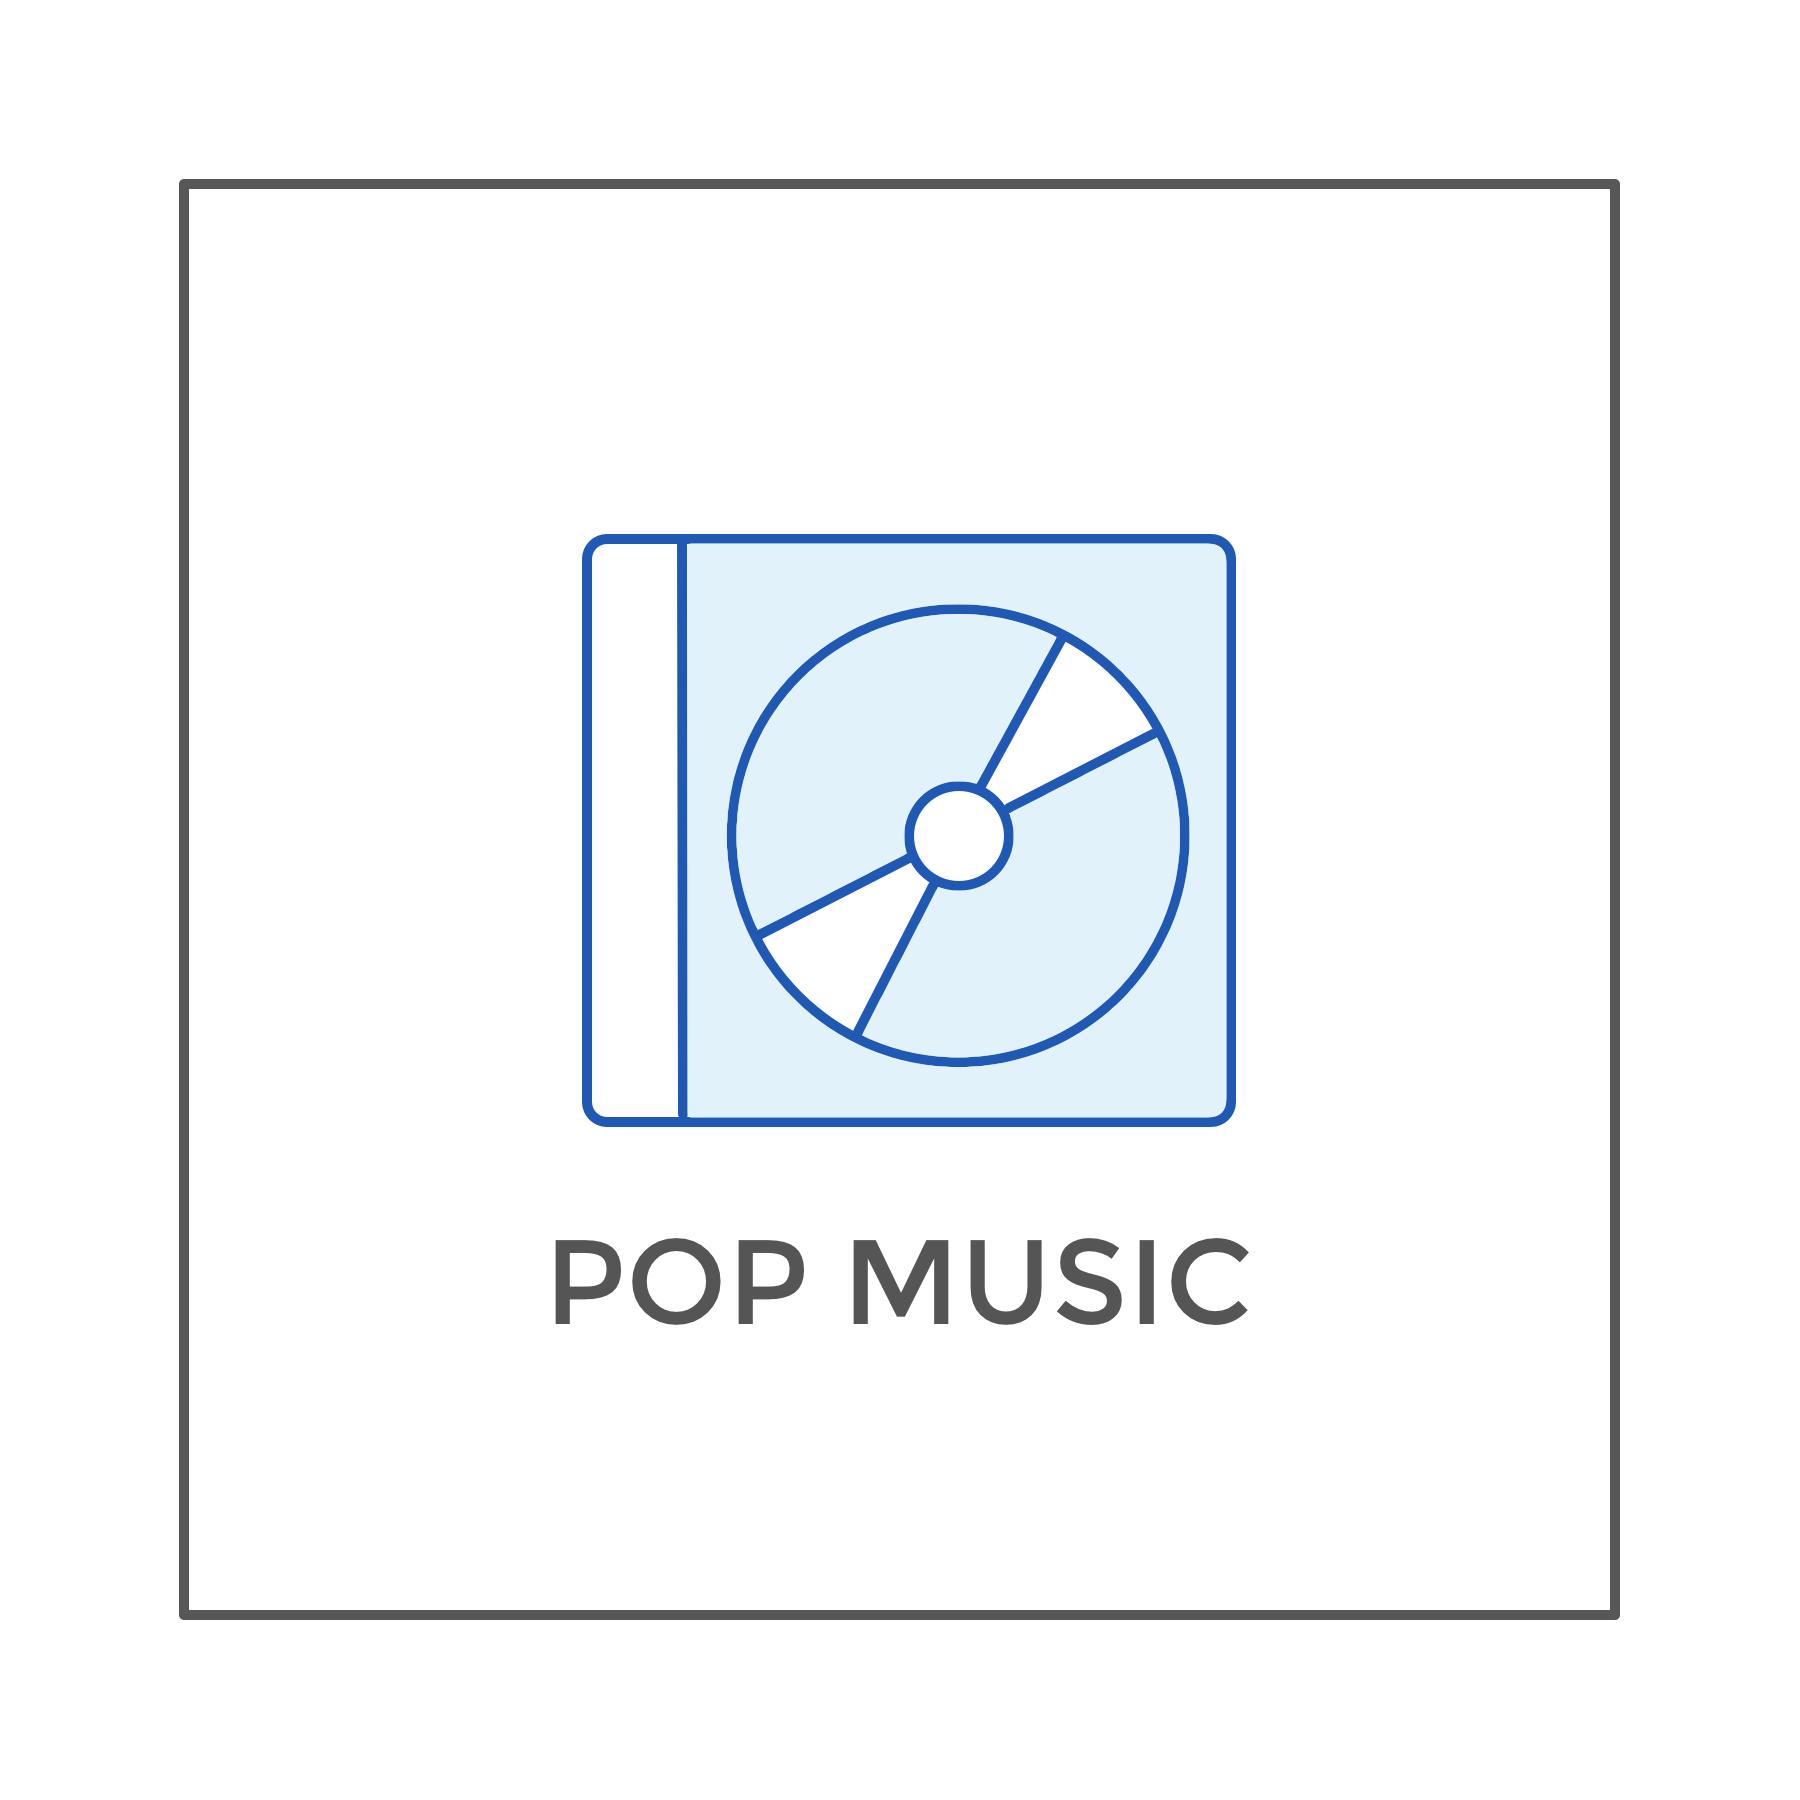 3Pop Music.jpg